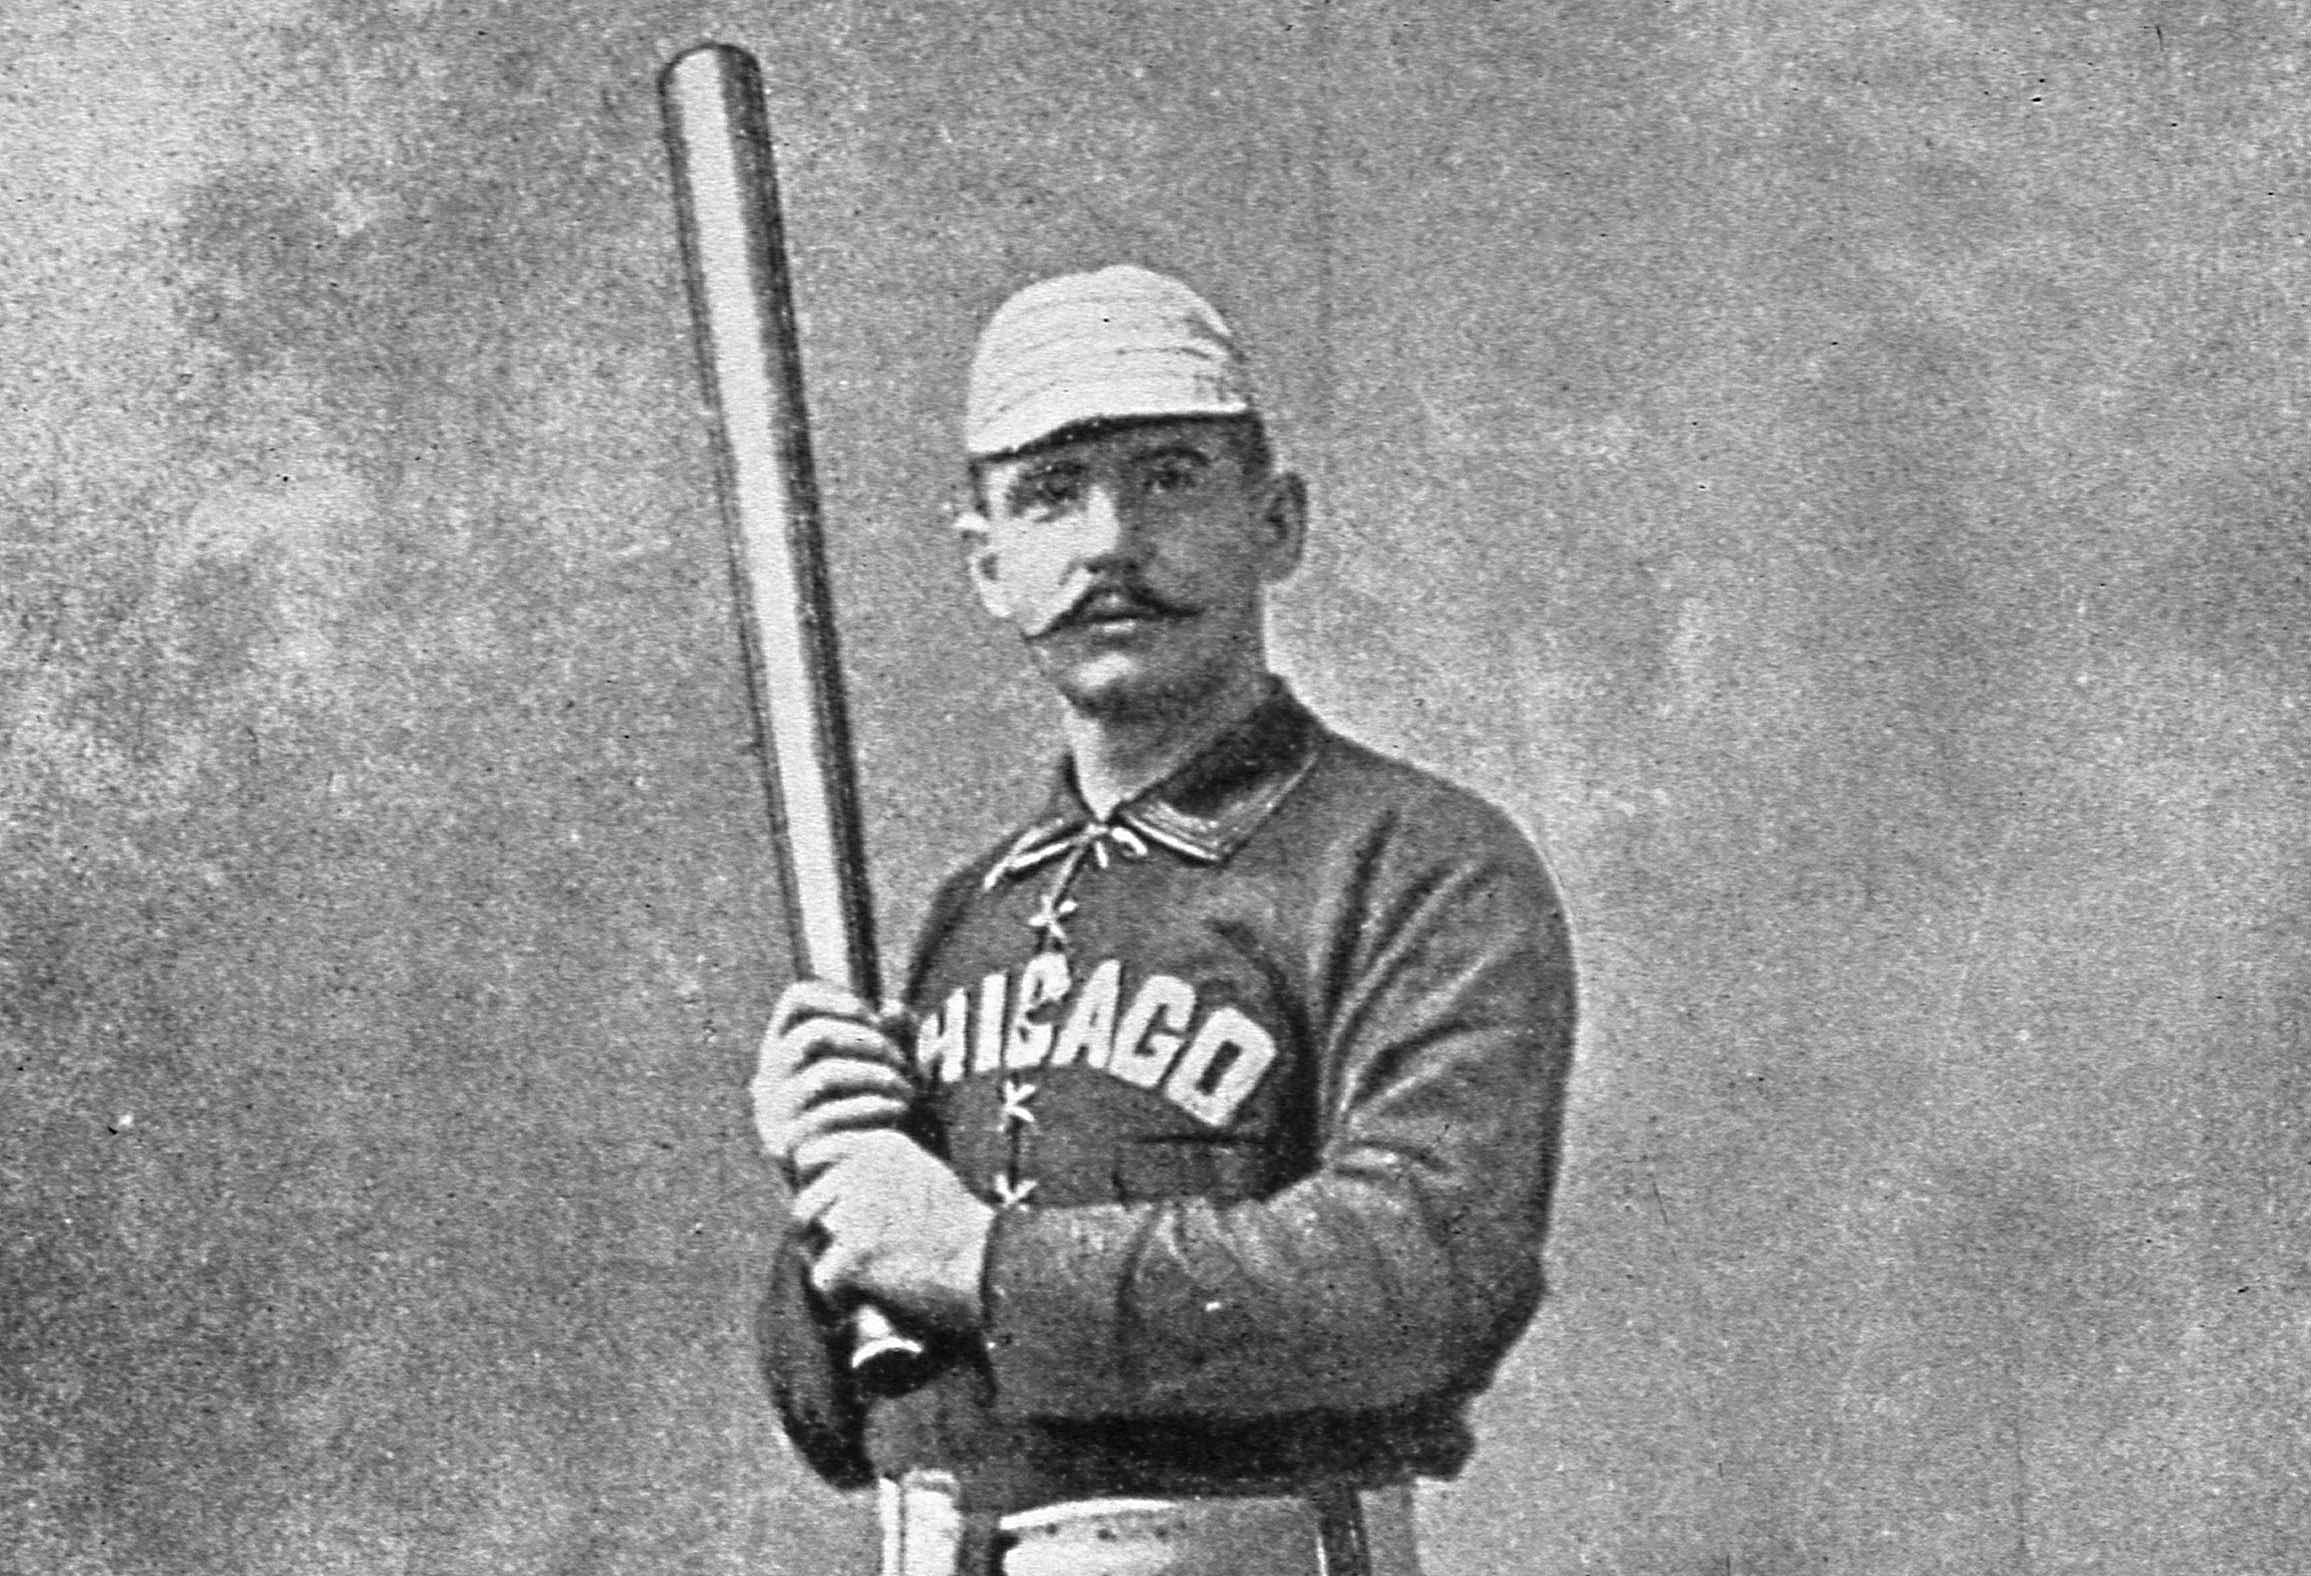 19th century baseball player Cap Anson